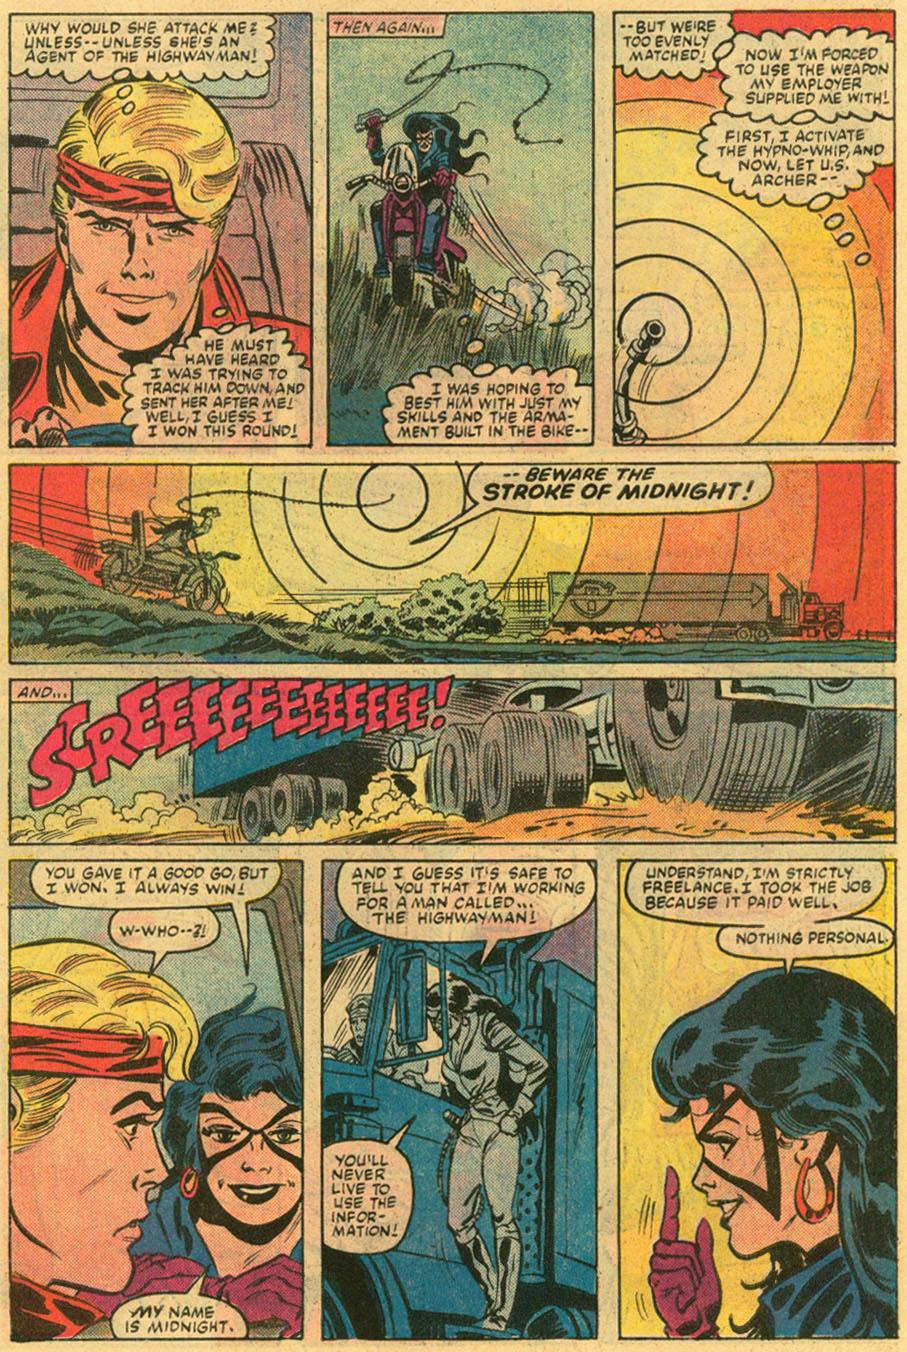 Read online U.S. 1 comic -  Issue #2 - 19